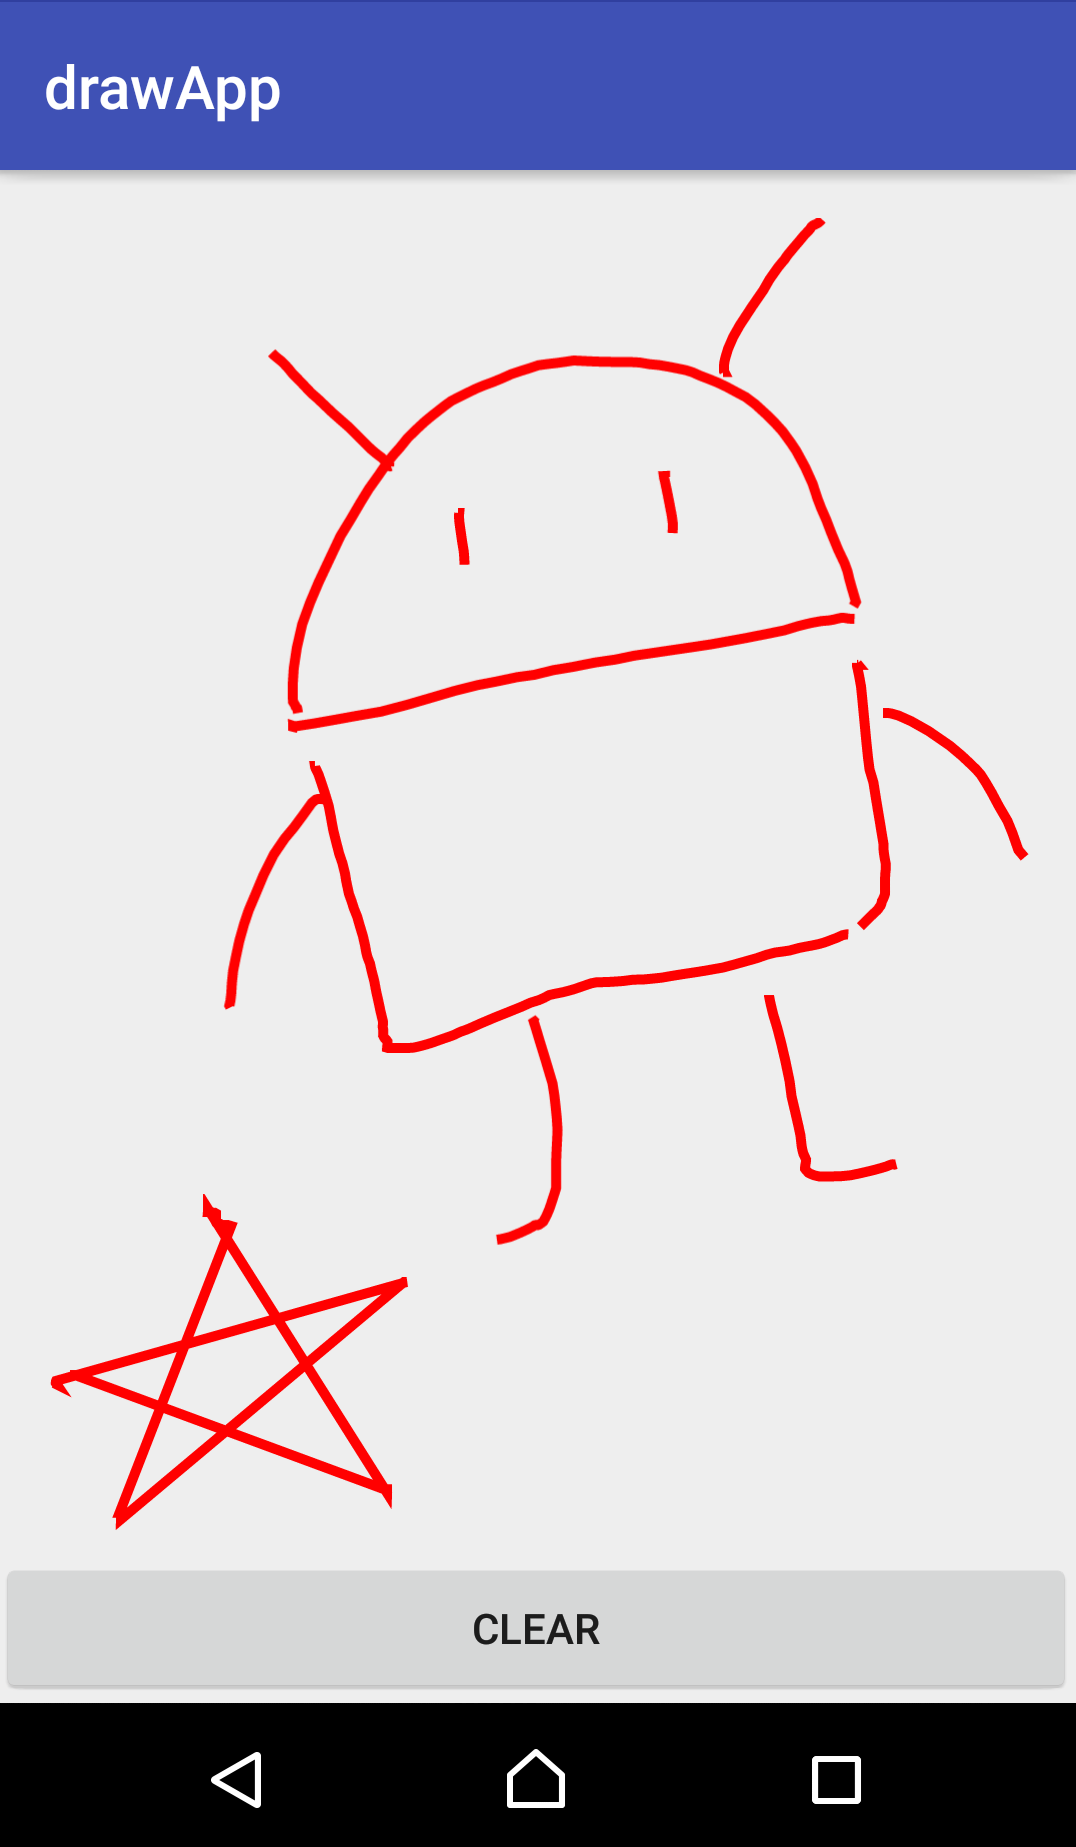 drawApp